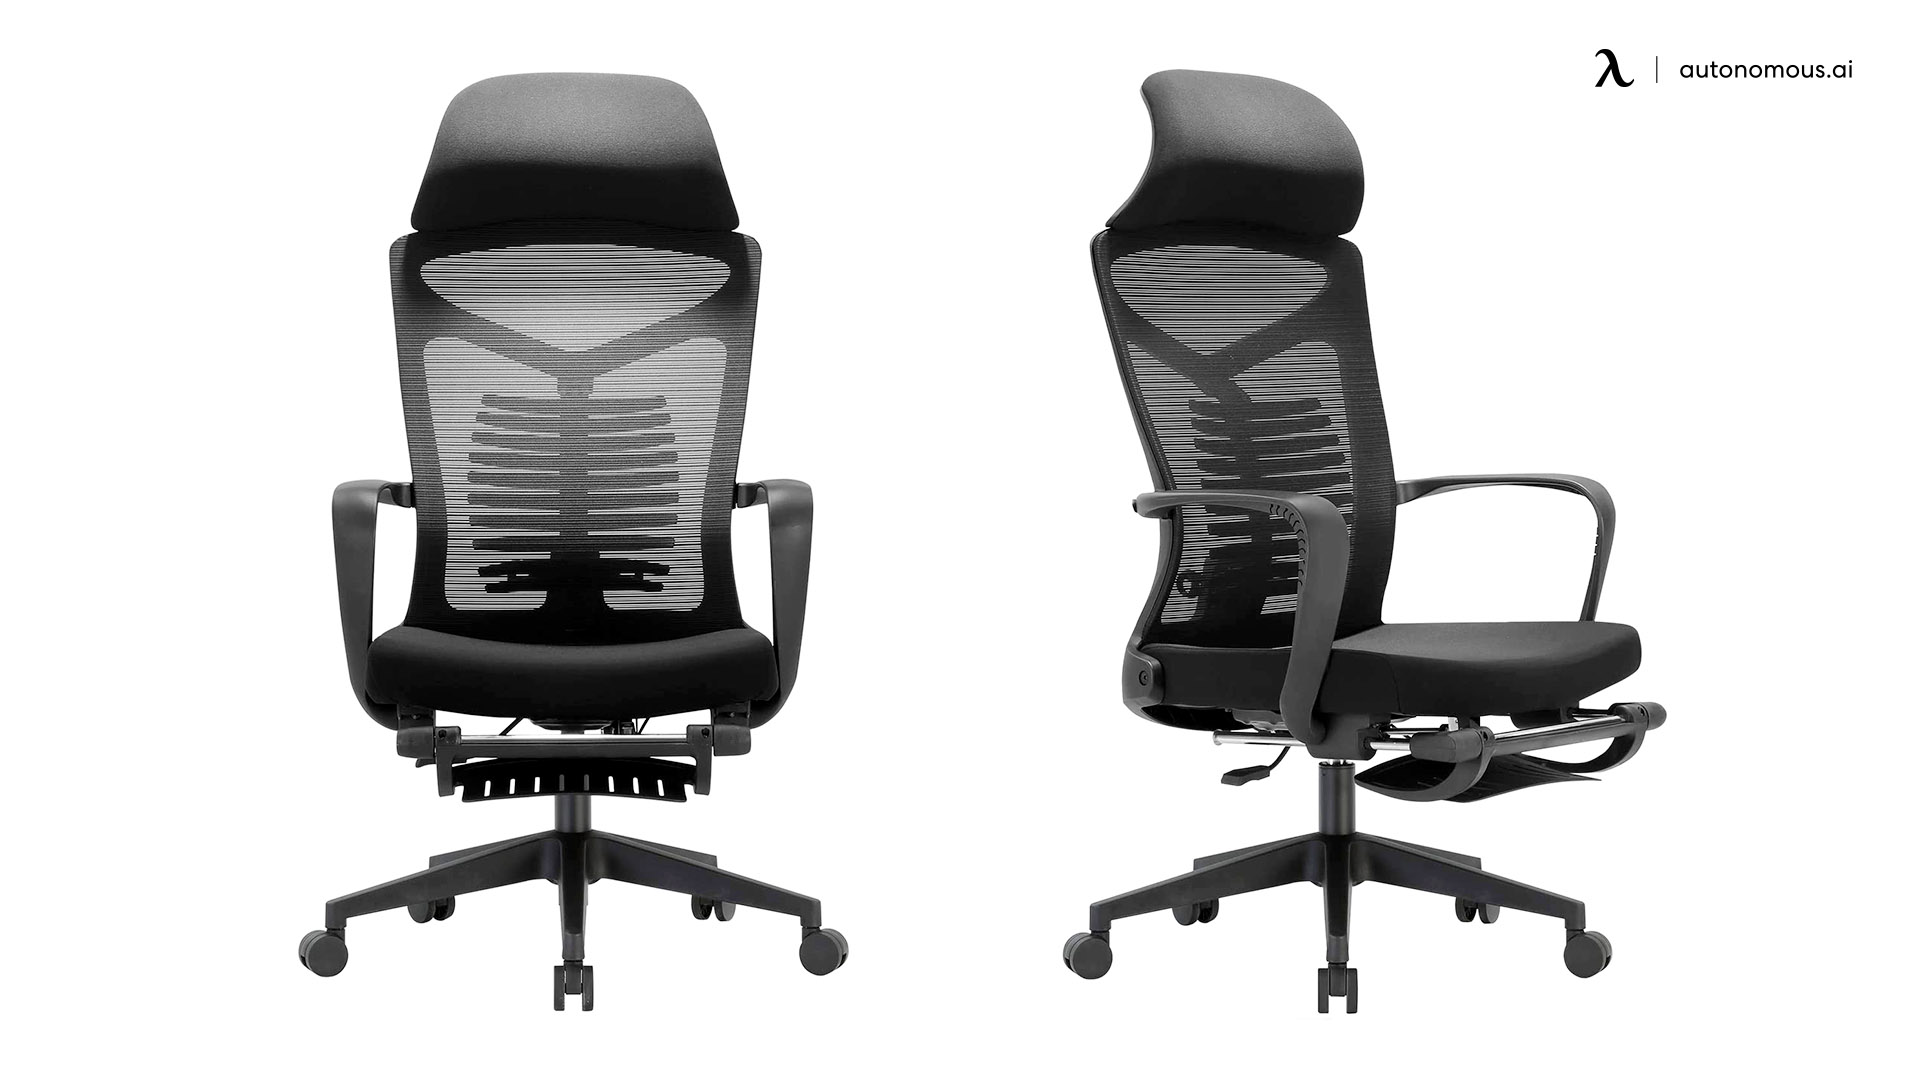 Sihoo Ergonomics Recliner Chair